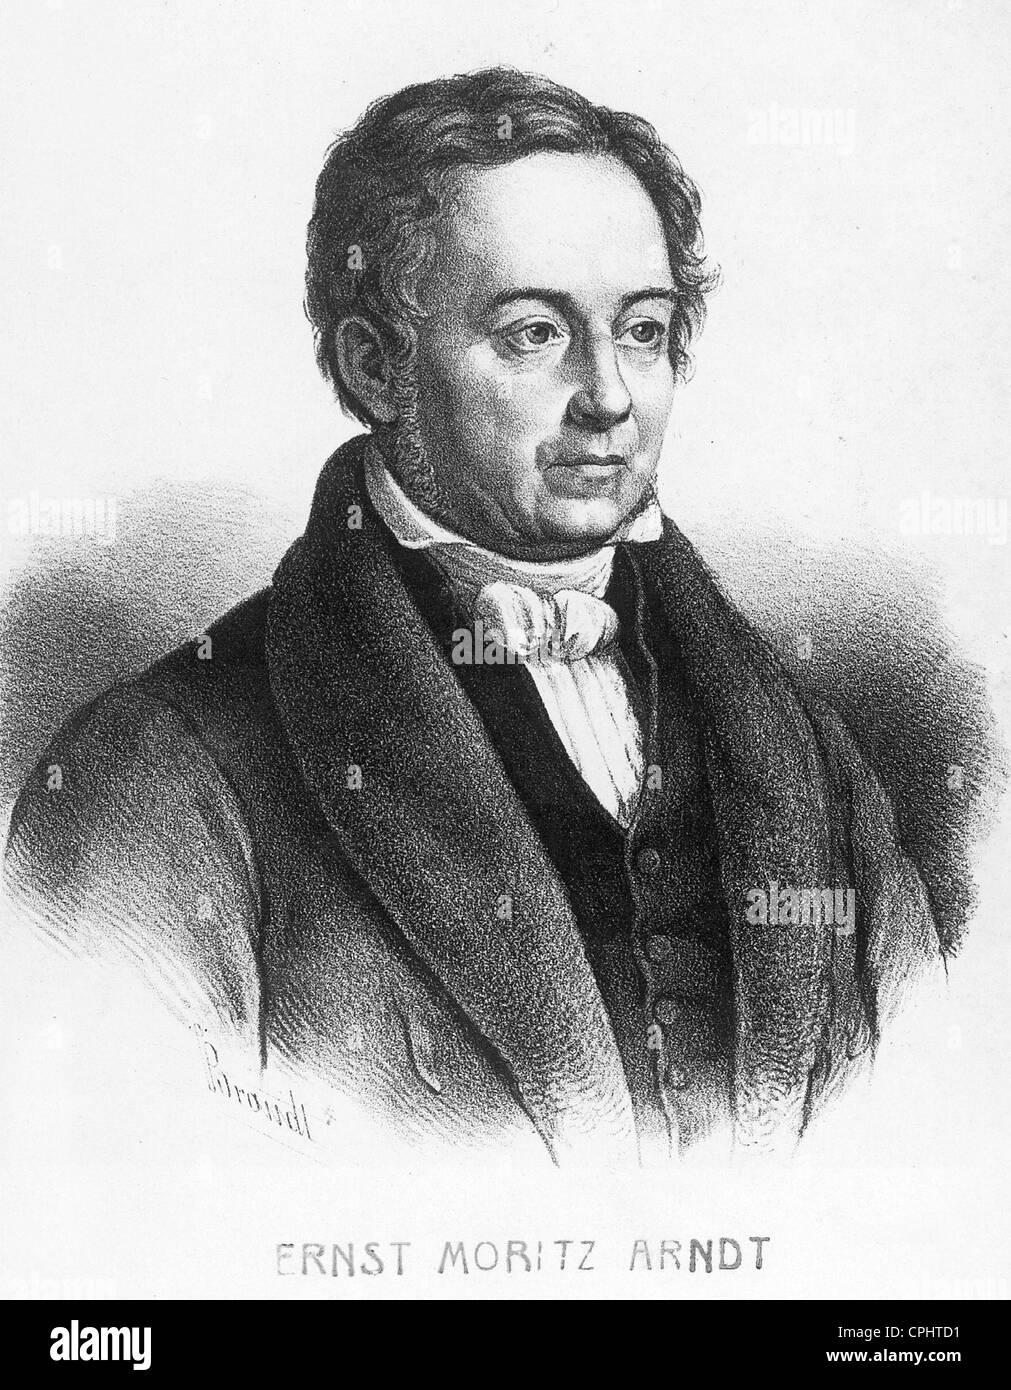 Ernst Moritz Arndt the german fatherland